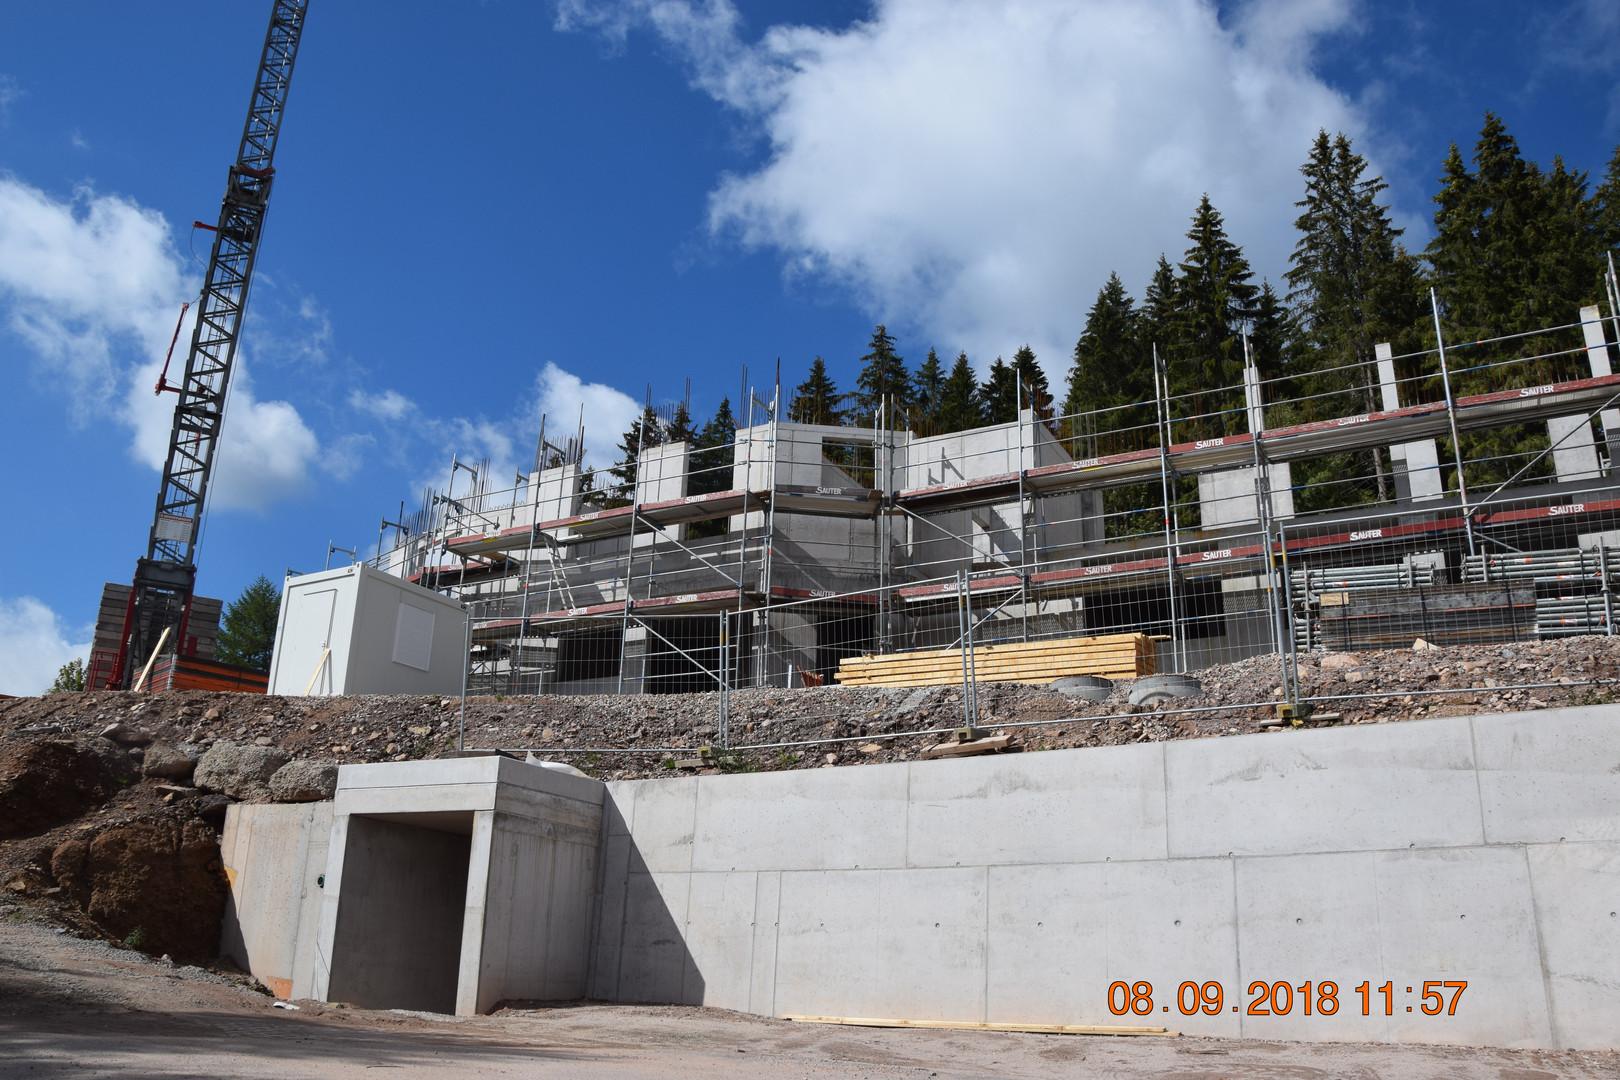 Baustelle am 08-09-18